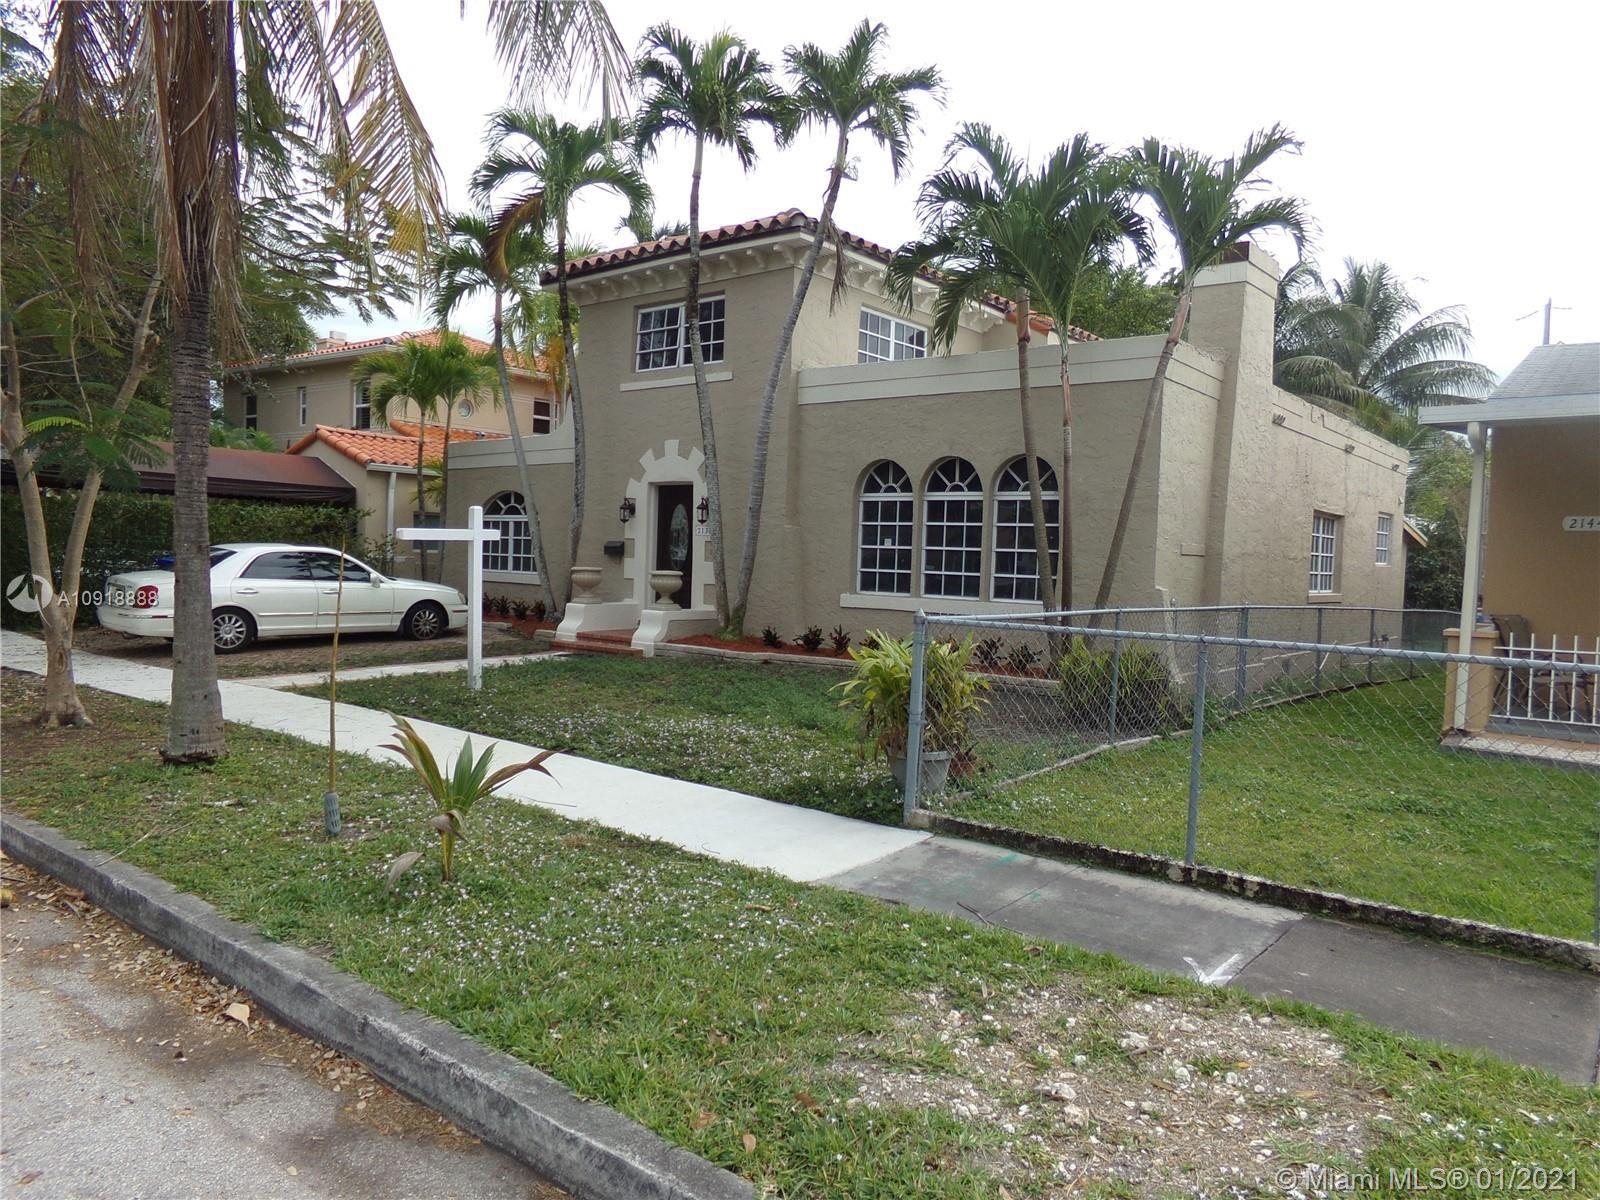 2138 SW 22nd Ter, Miami, FL 33145 - #: A10918888